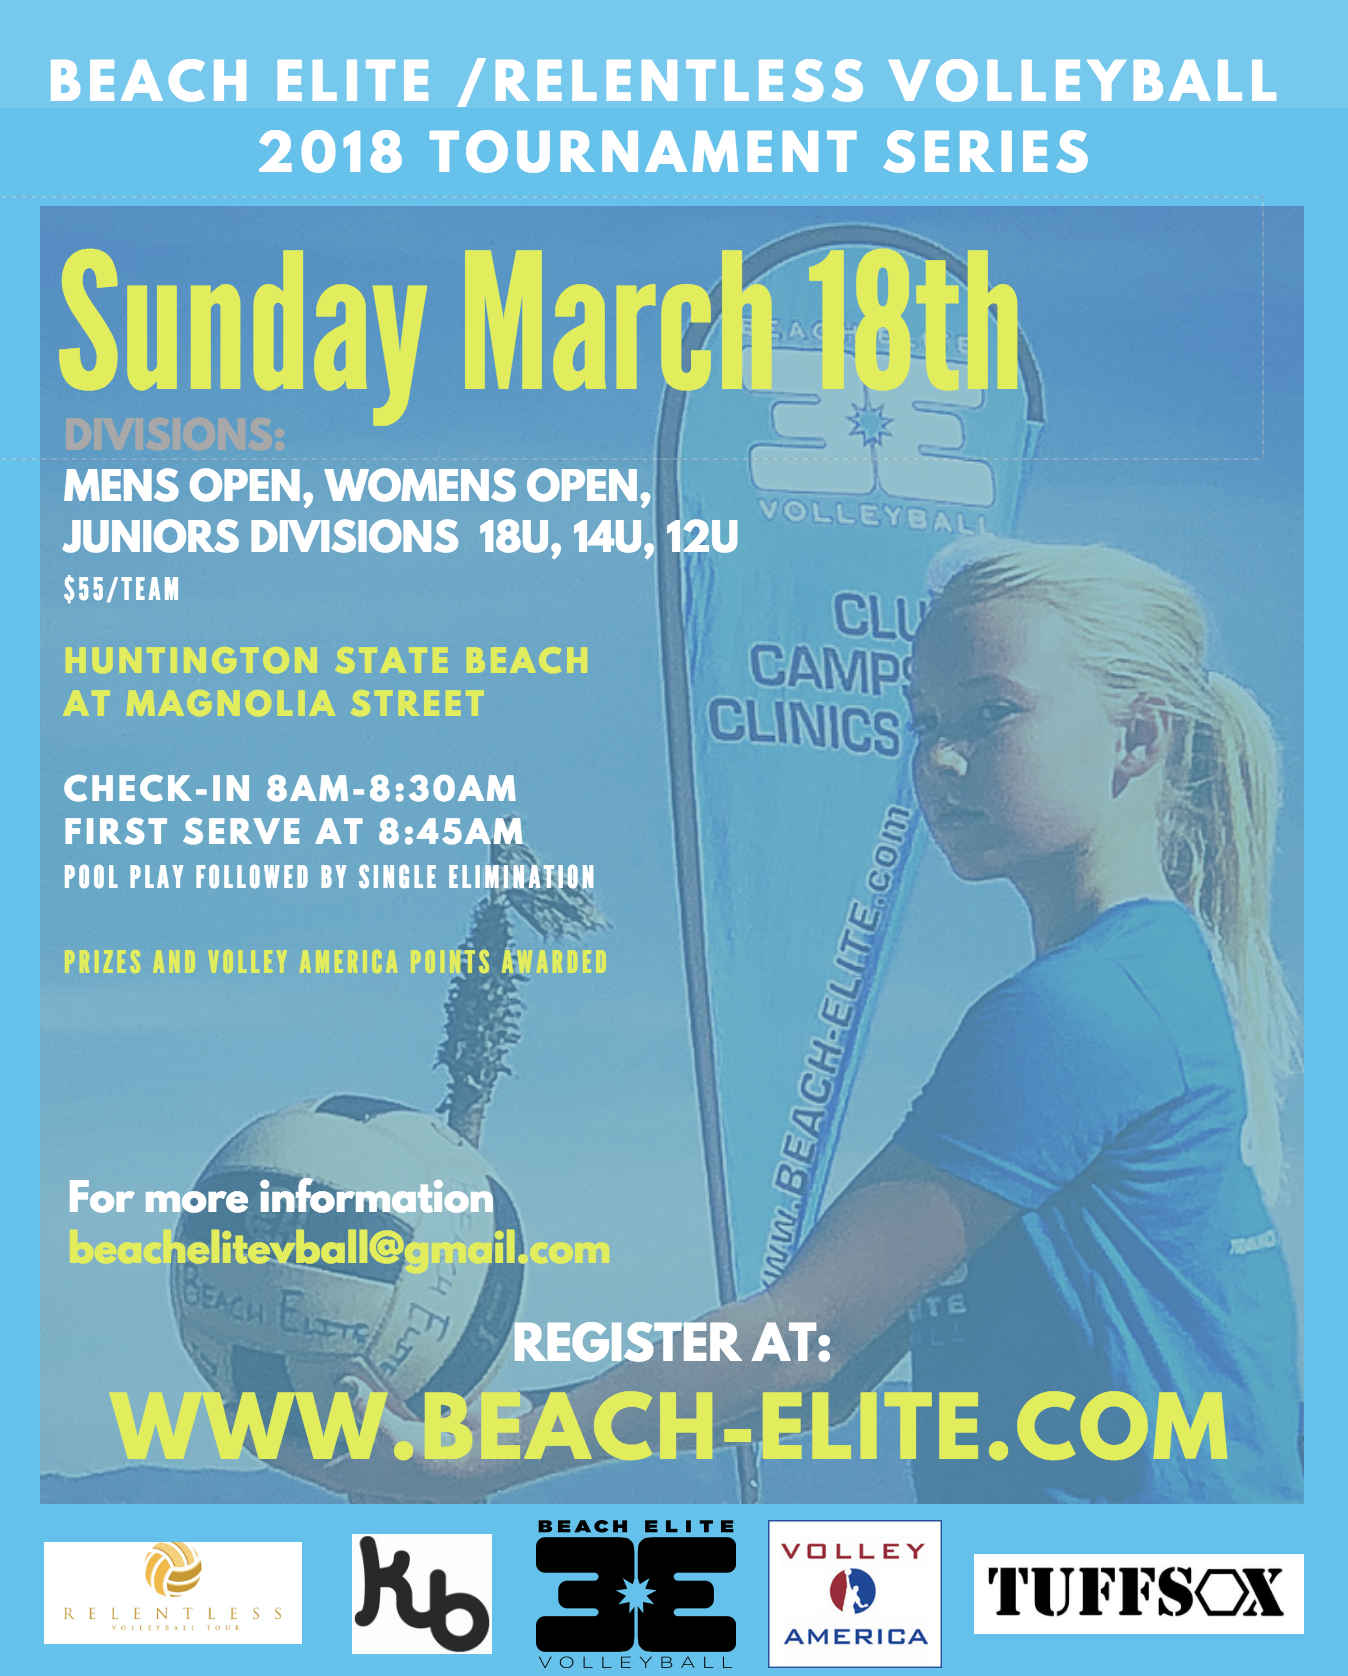 beach elite tournament series